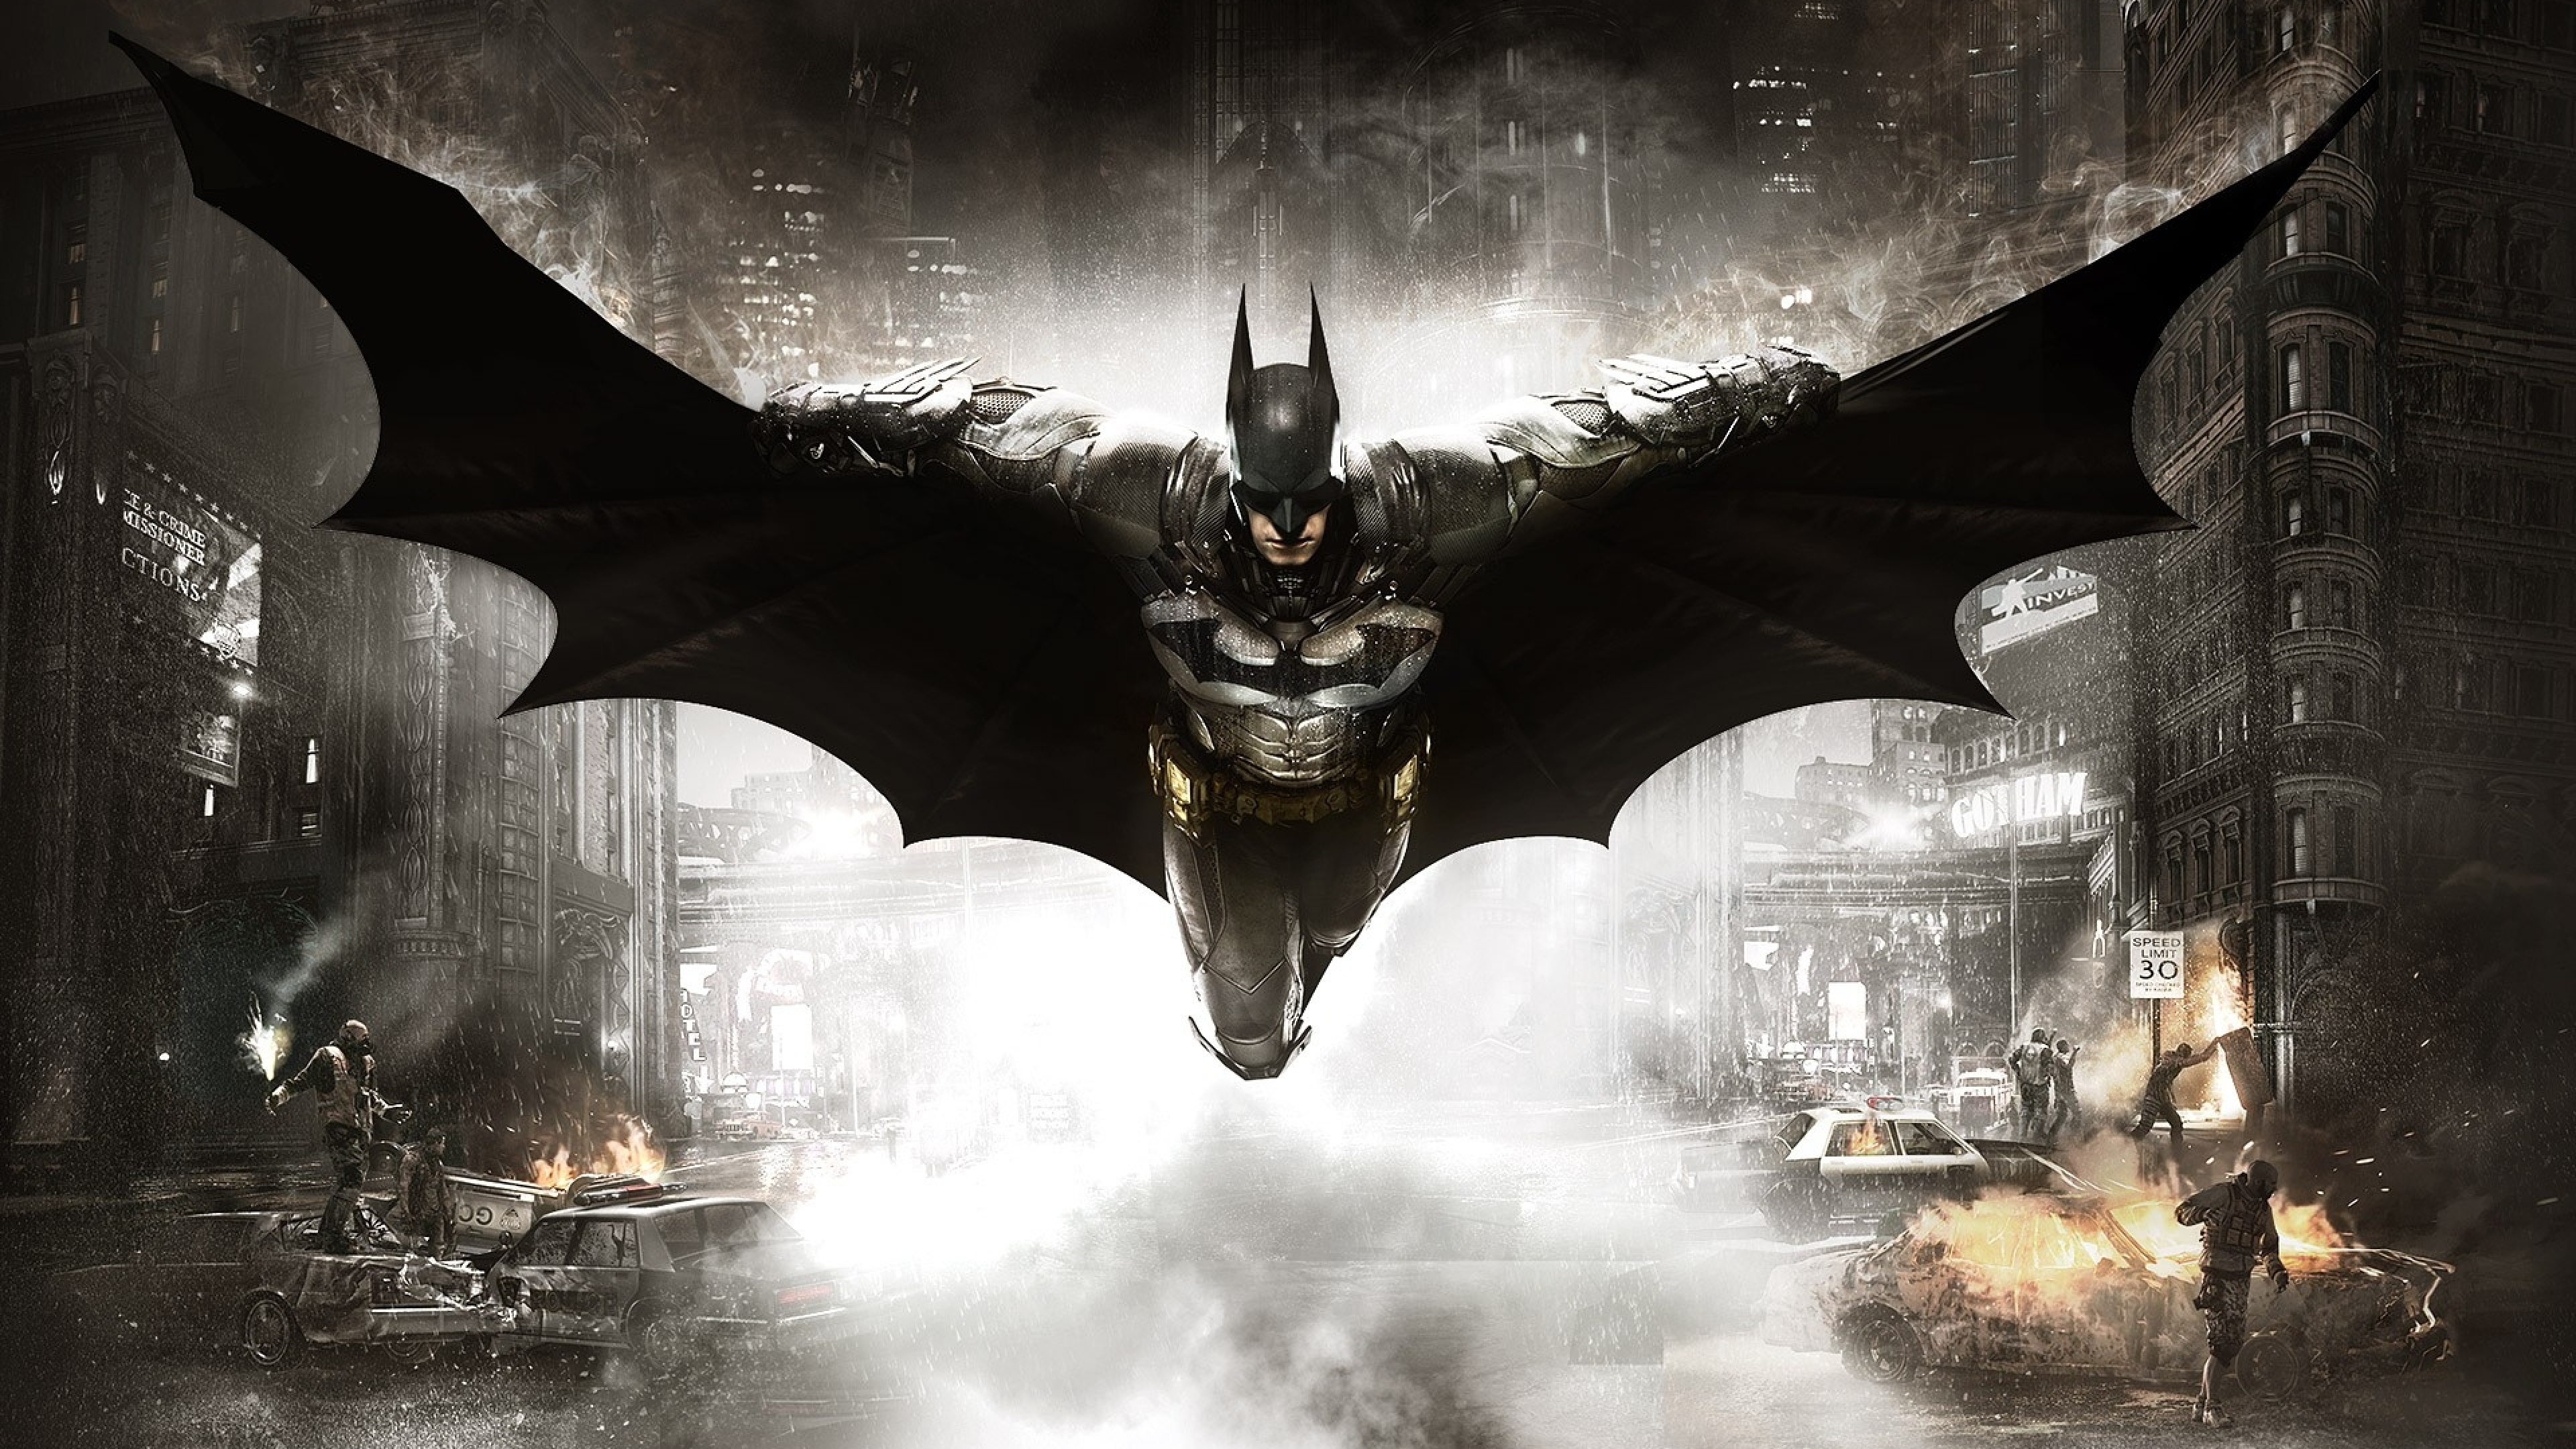 batman arkham knight 2 1535966024 - Batman Arkham Knight 2 - games wallpapers, batman wallpapers, batman arkham knight wallpapers